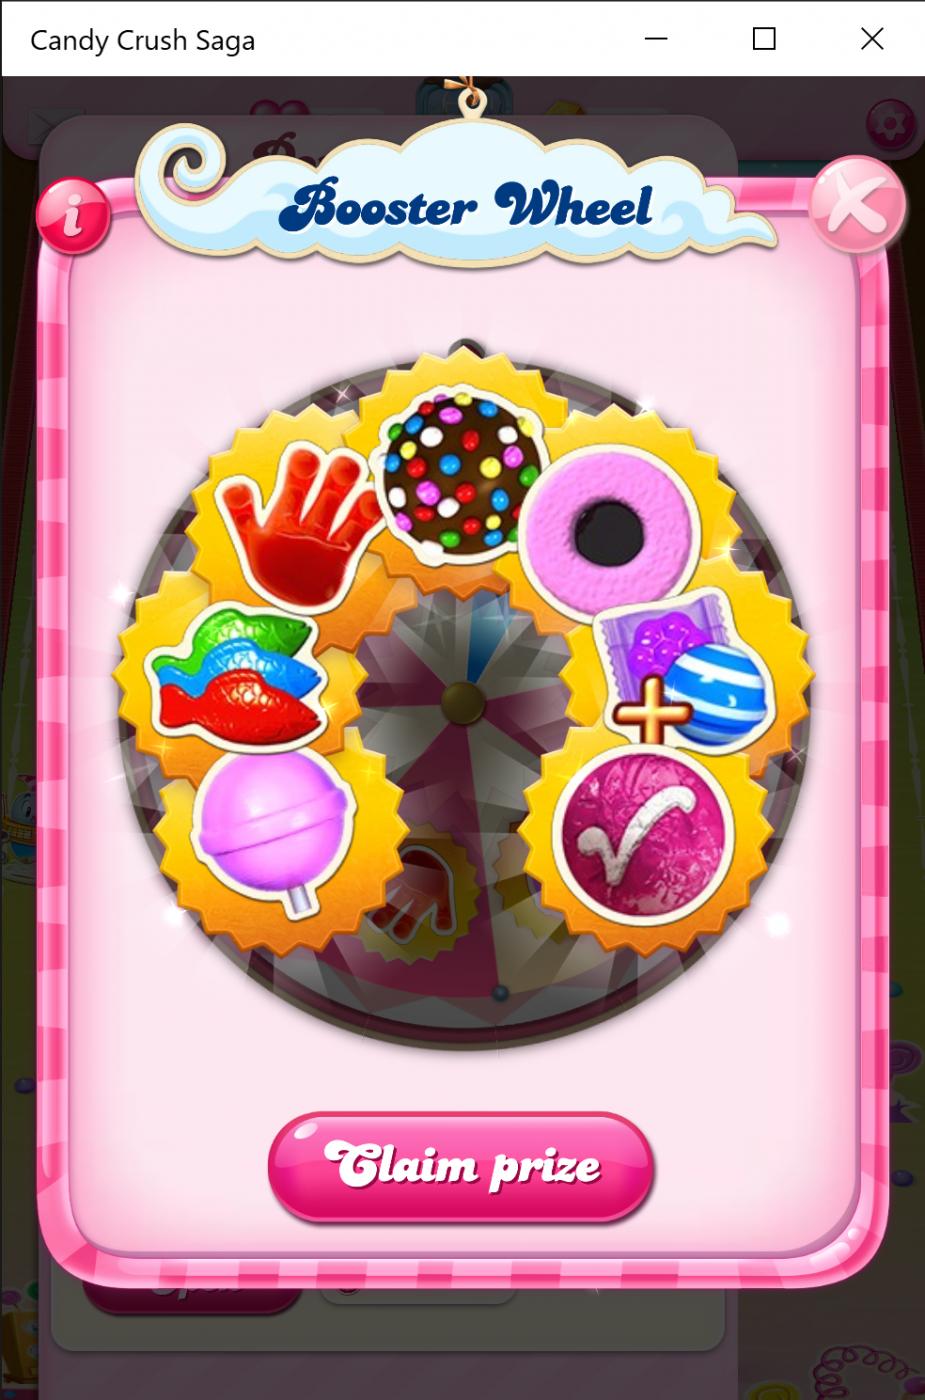 Candy Crush Saga 2_26_2020 9_21_04 AM.png